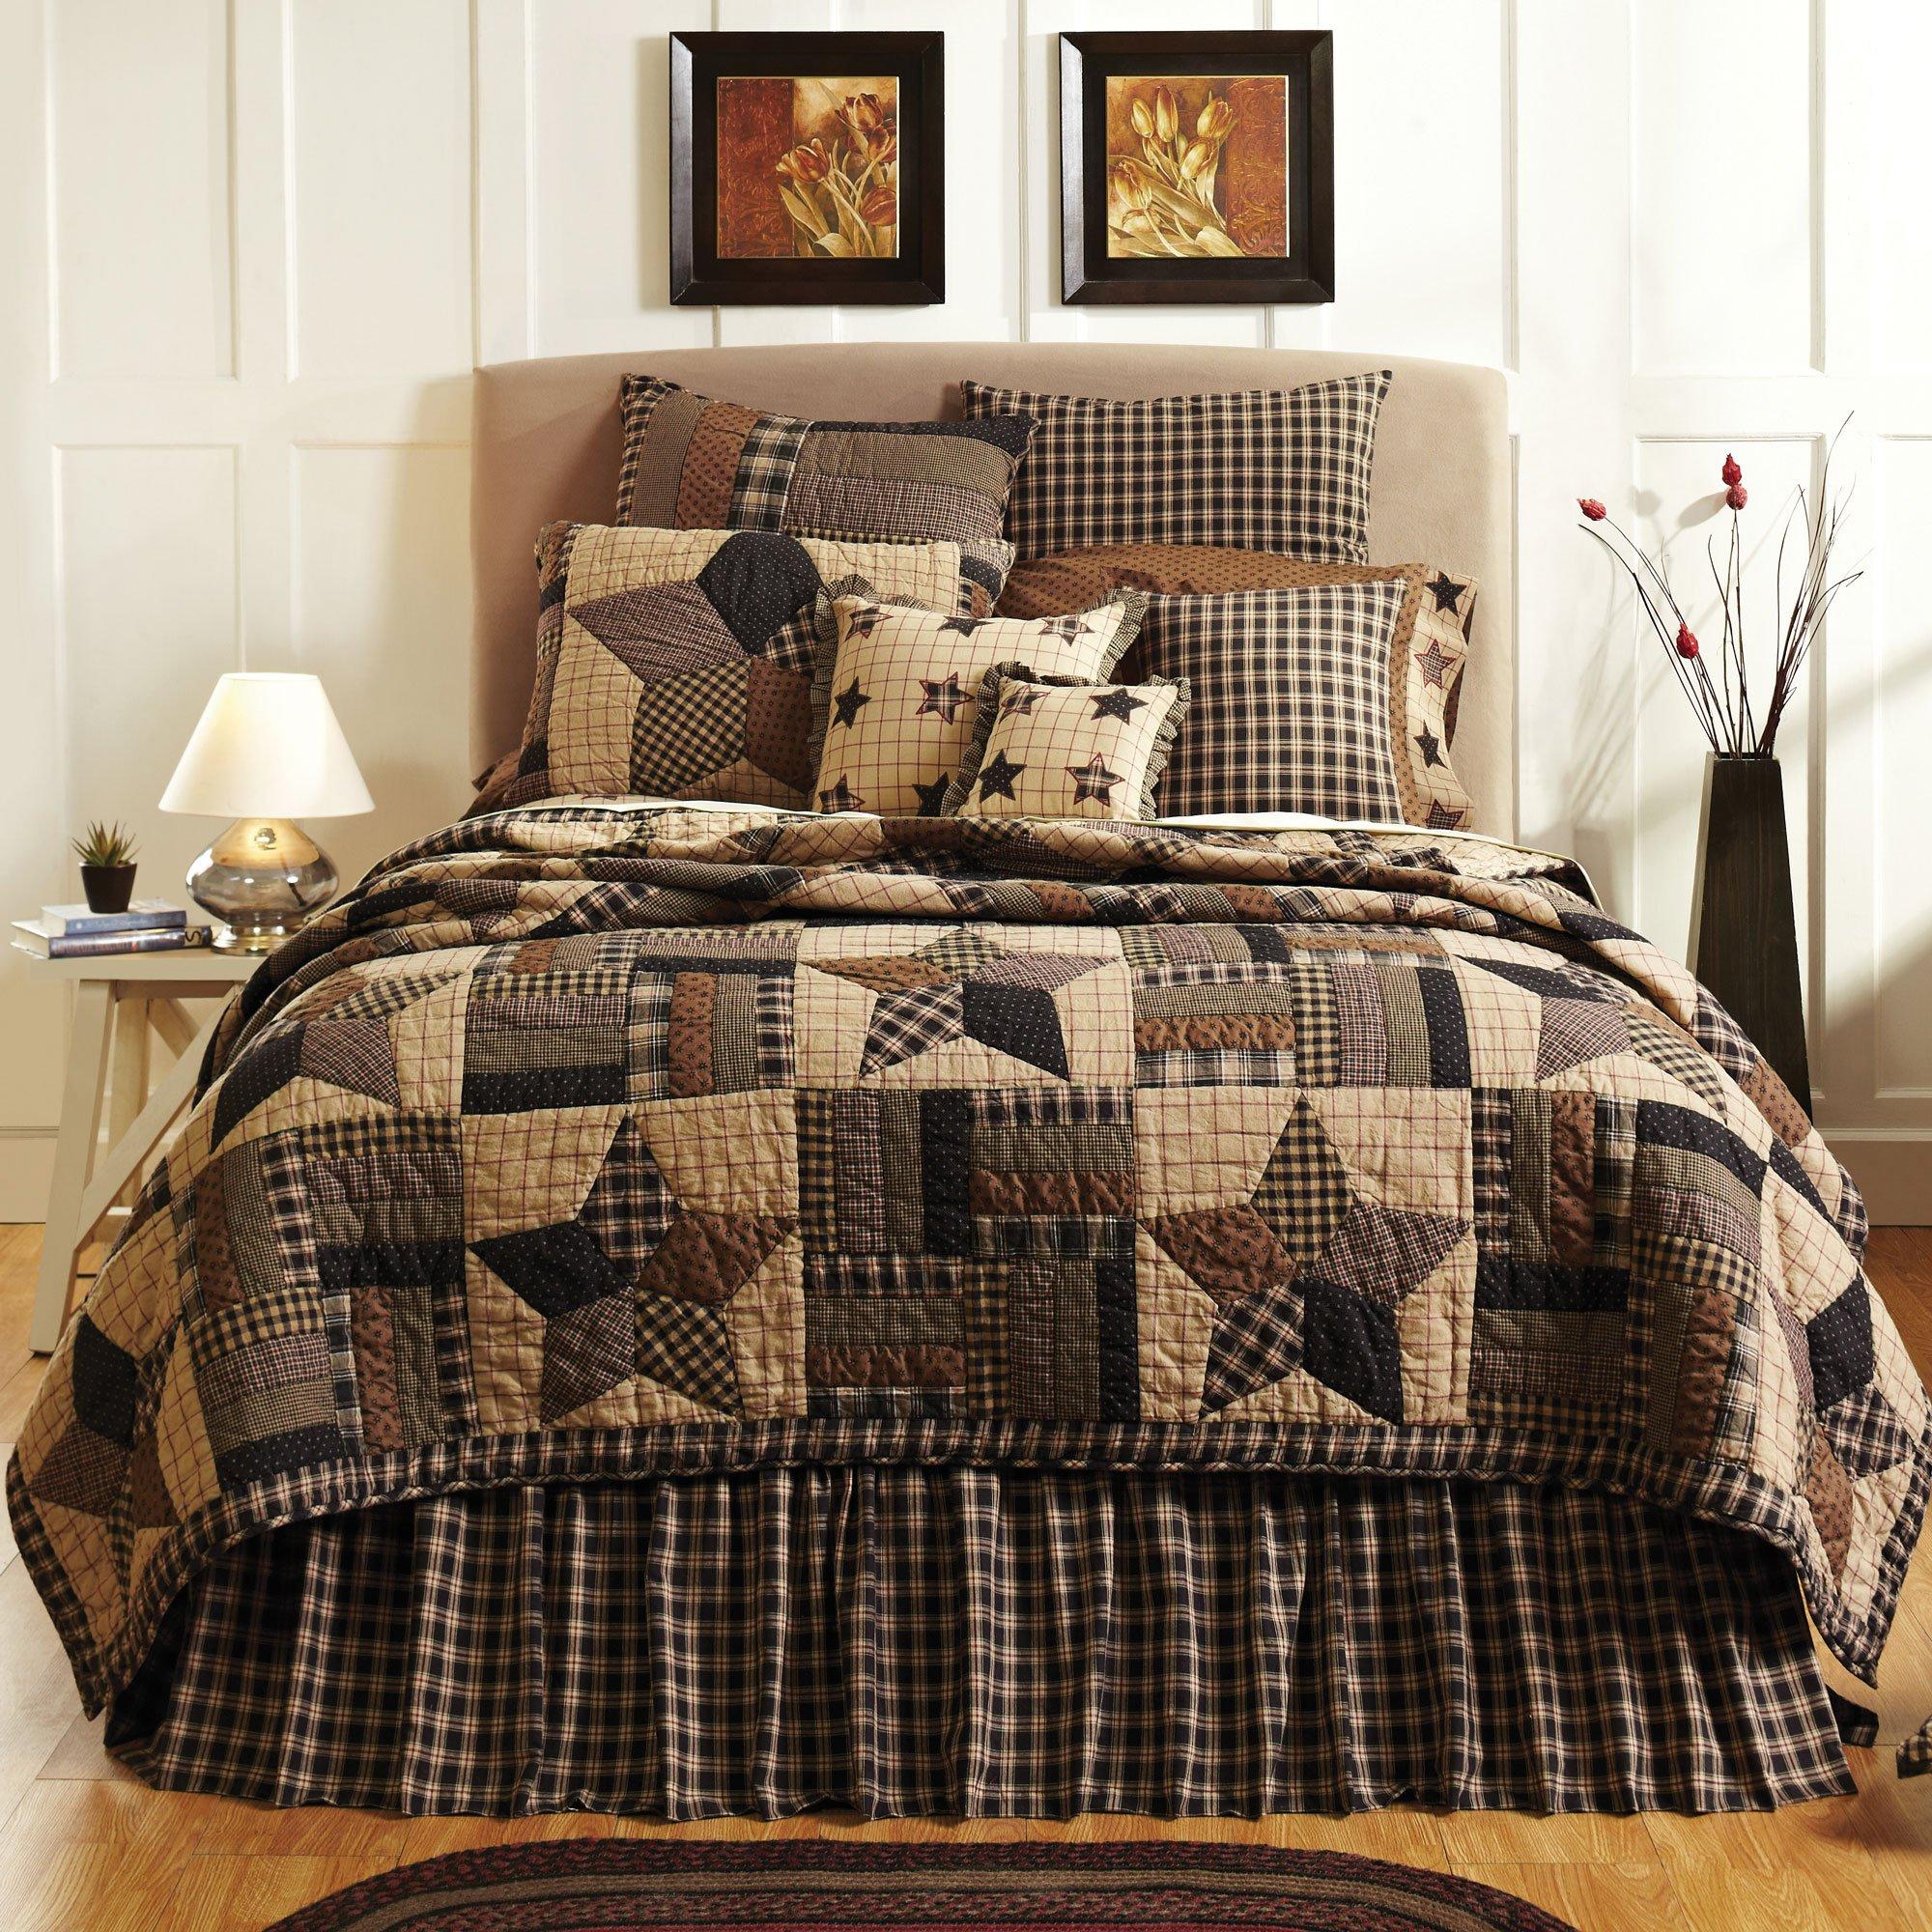 Bingham Star Queen Quilt Bundle - 5 Pc Set. Set Contents: 1 Queen Quilt (94 x 94), 2 Queen Shams (21 x 27), 1 Queen Bed Skirt (80 x 60), 1 Pillow 1 (16 x 16) by Lasting Impressions